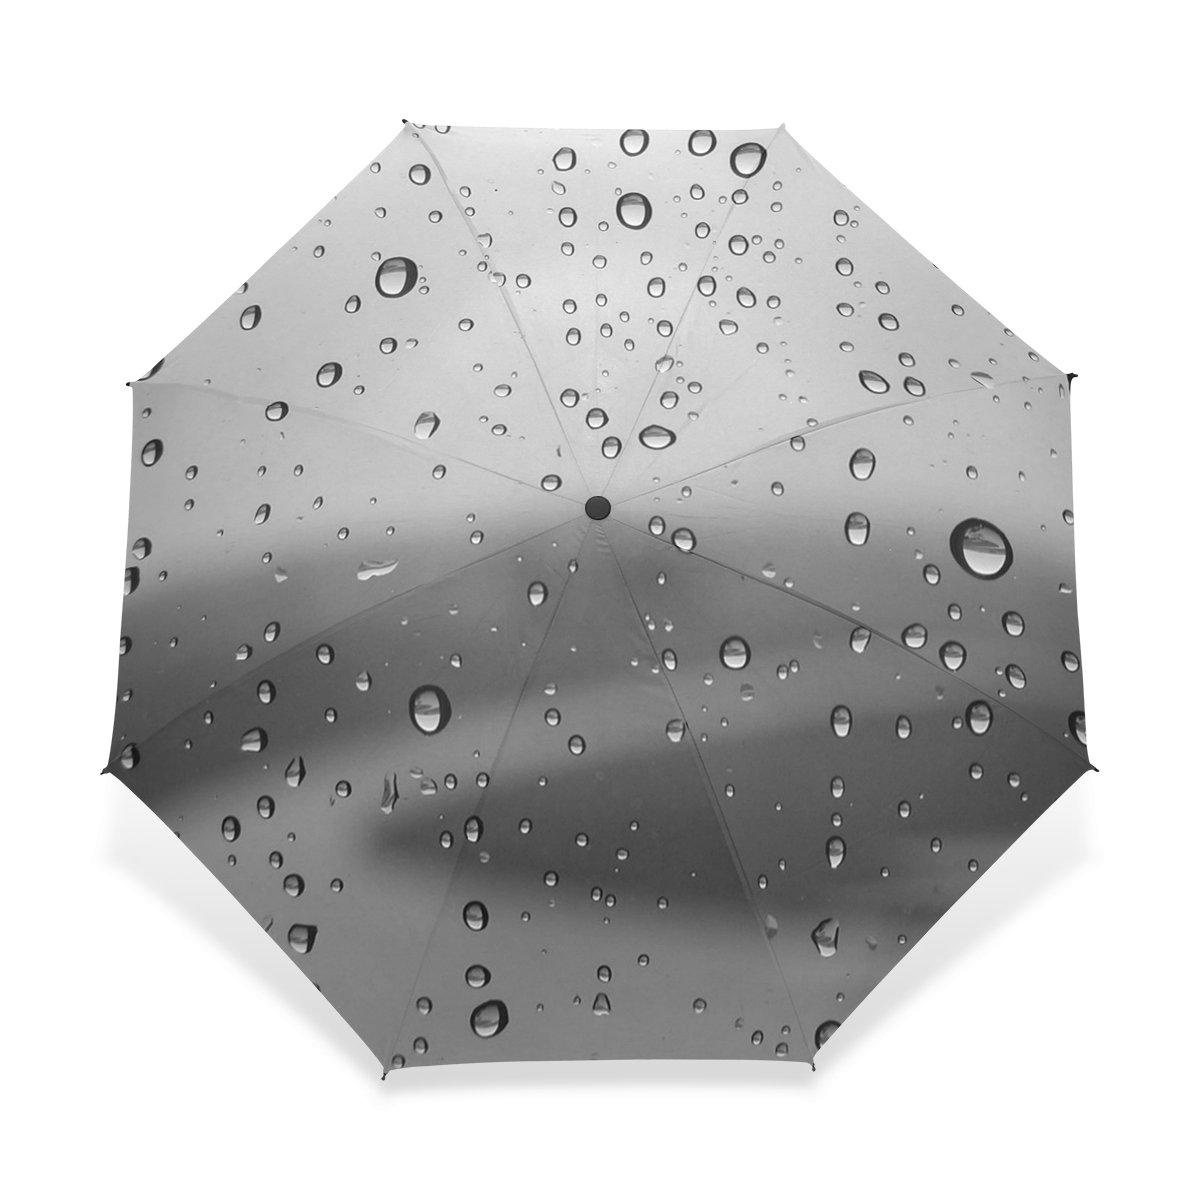 baihuishop防風ゴルフ傘、コンパクトで旅行for Easy Carryingスポーツ雨傘 – 強力なフレームUnbreakable Water Dropsパターンパターン   B01FQJICCW